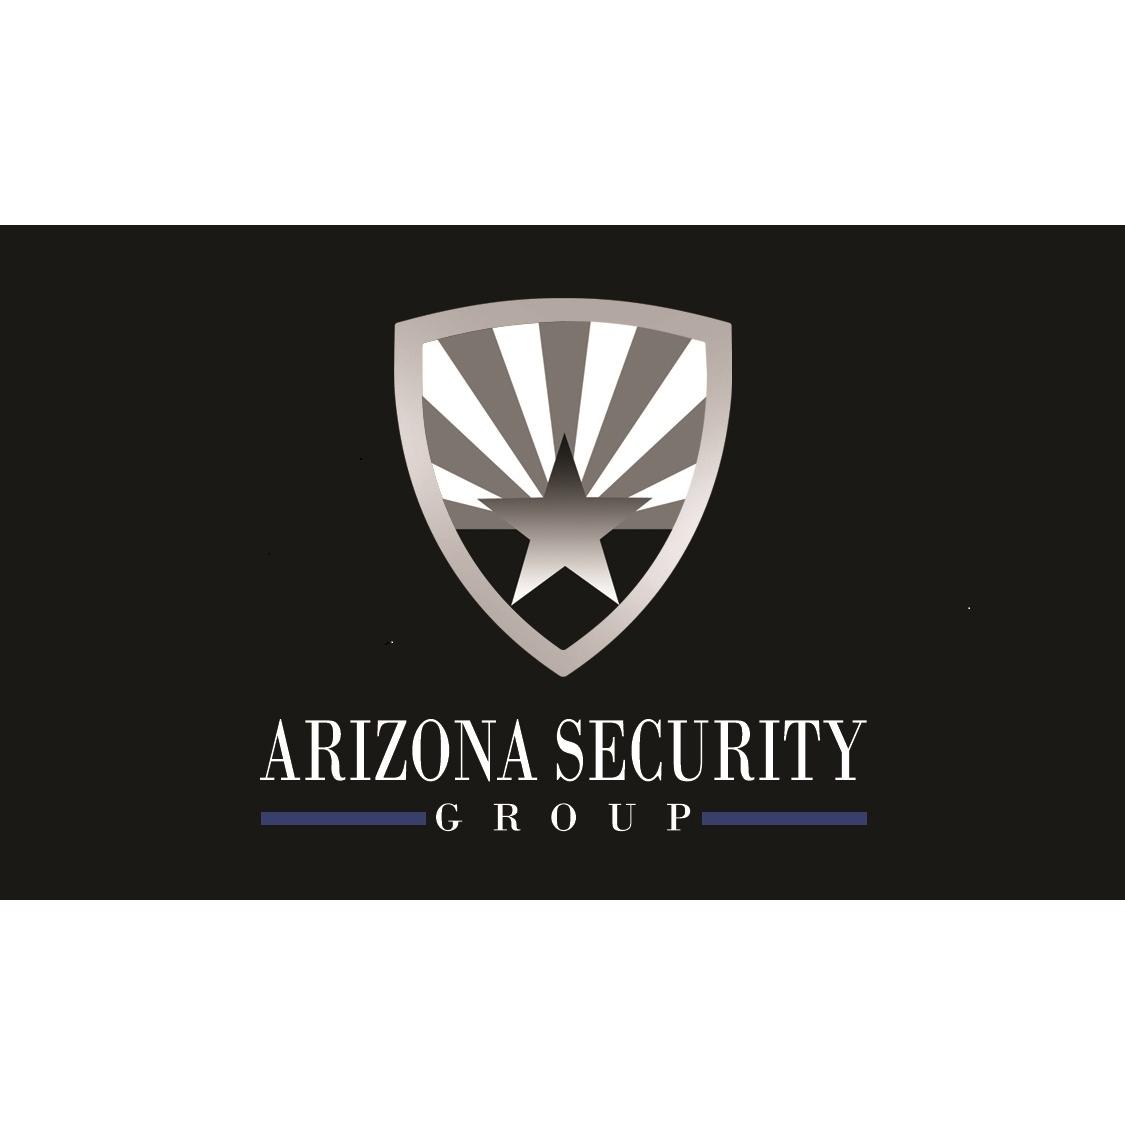 Arizona Security Group